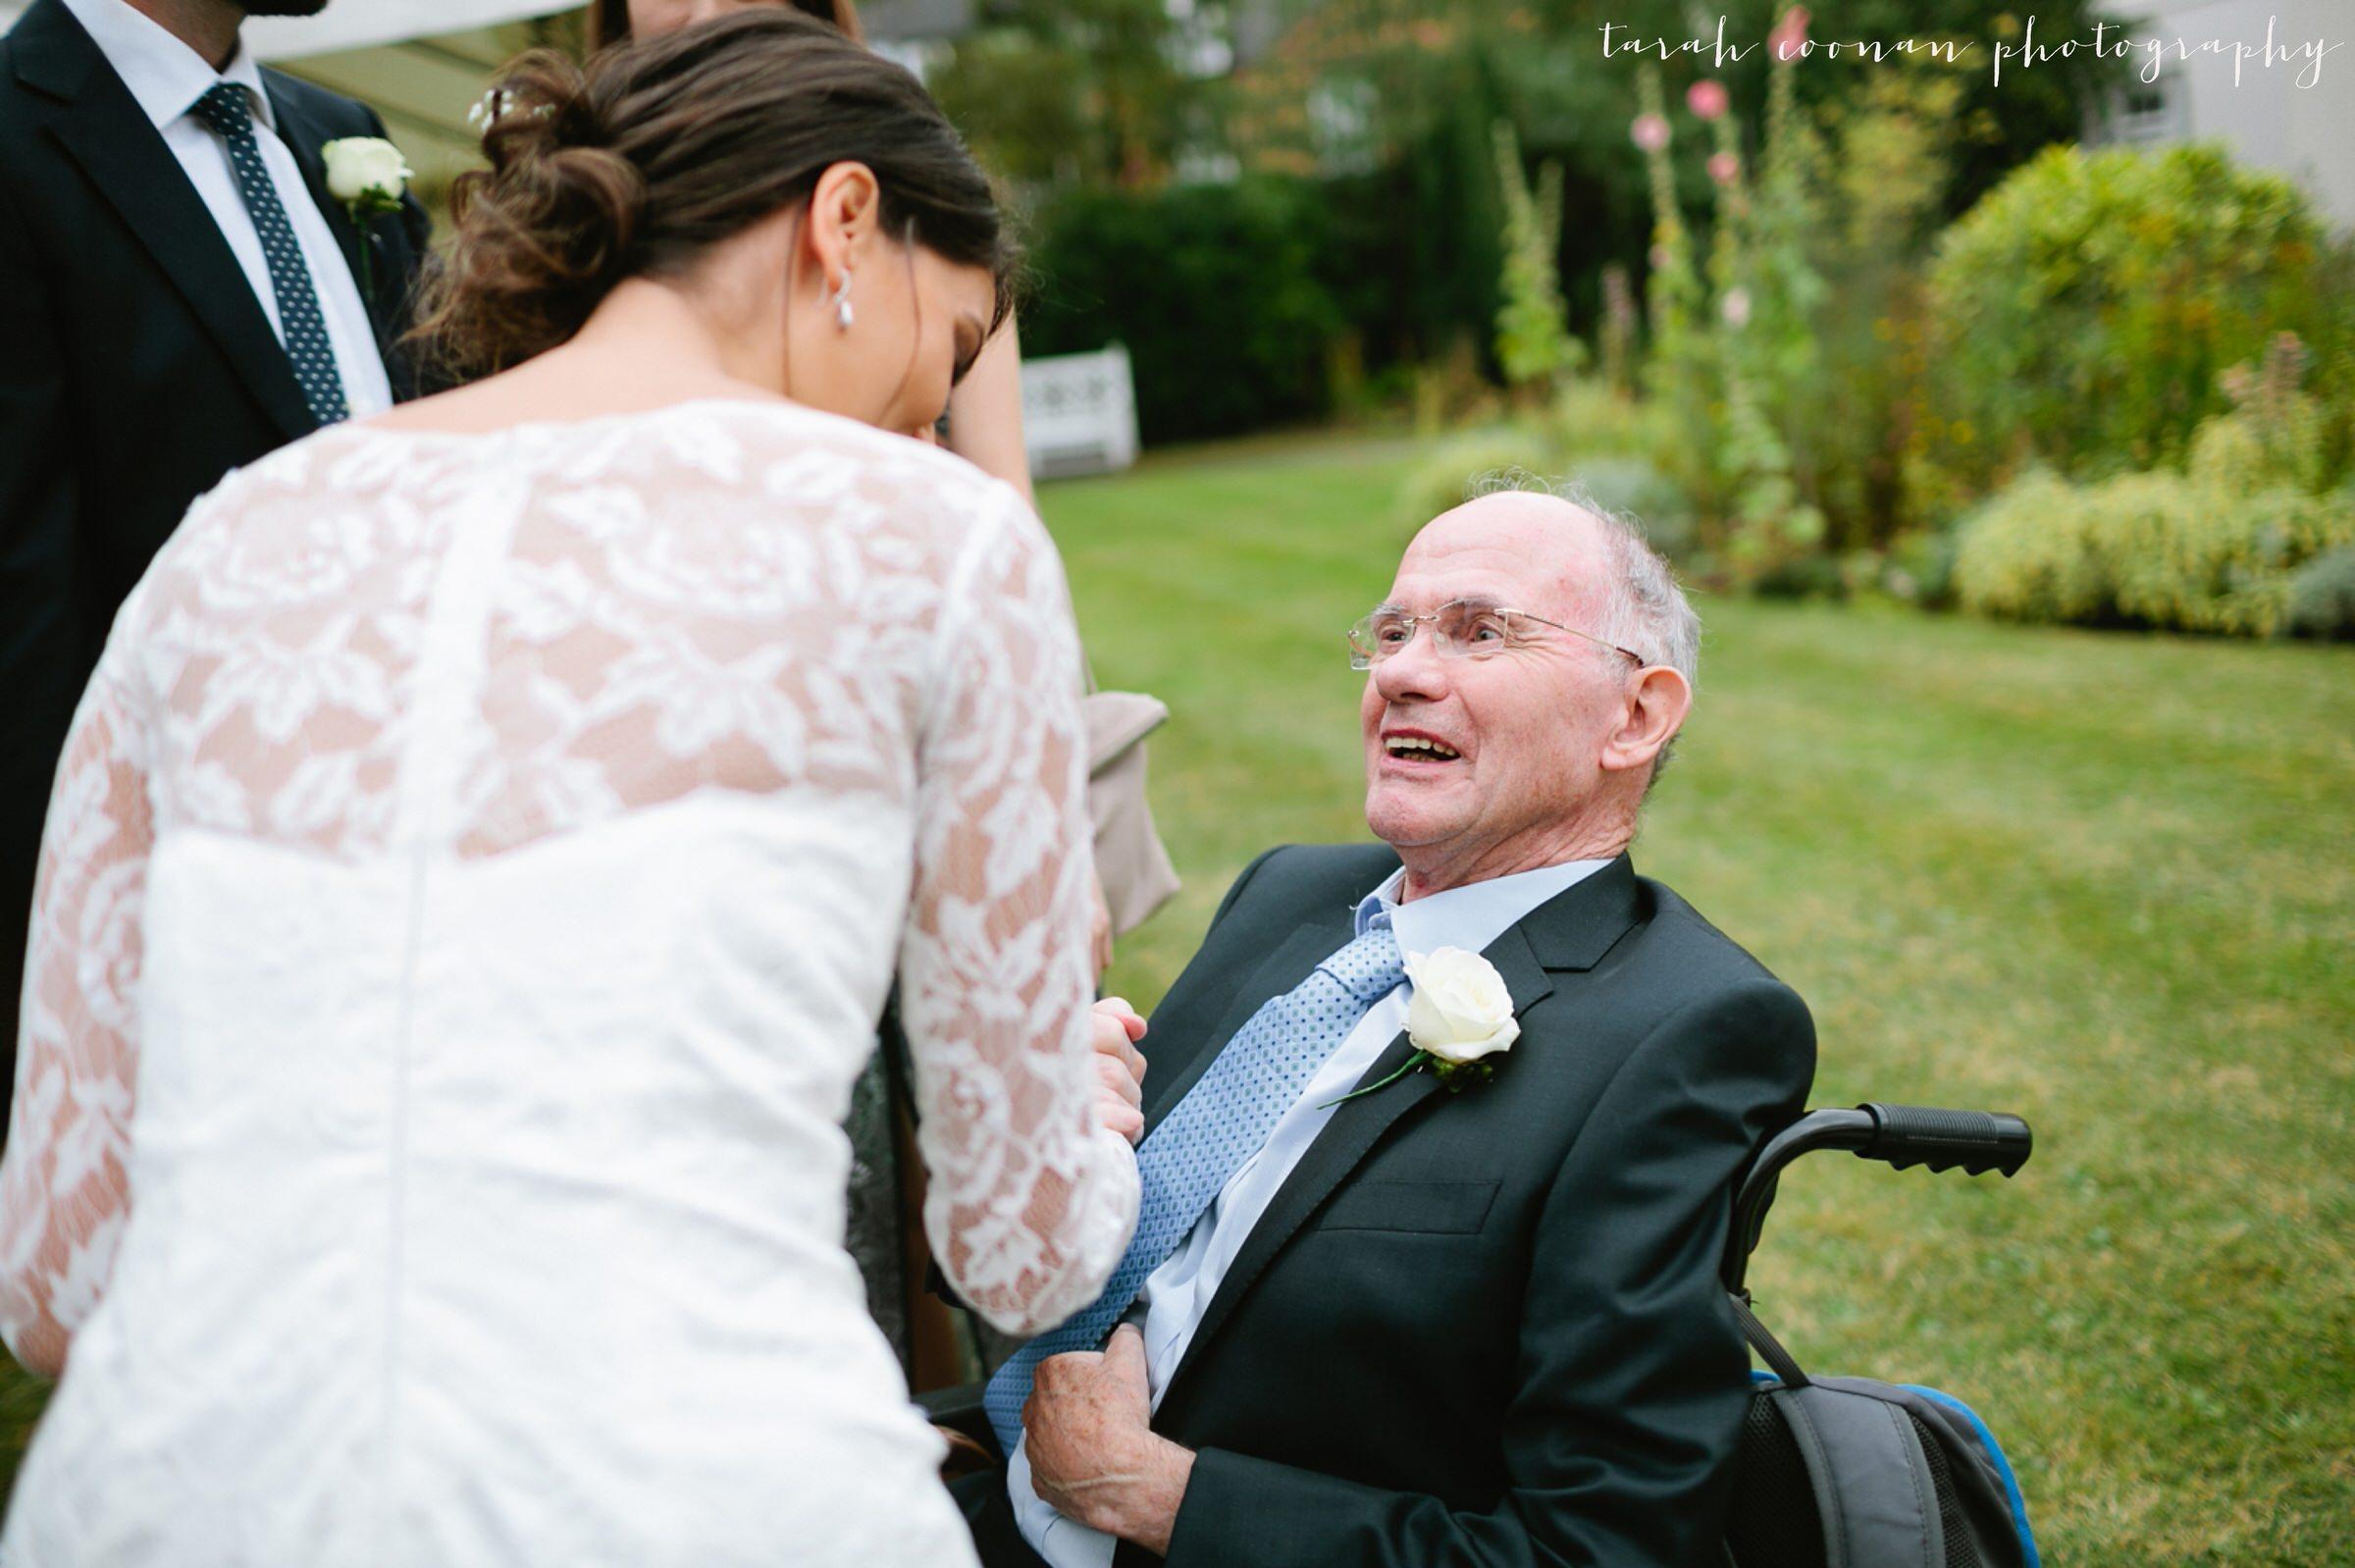 birmingham-wedding-photographer_053